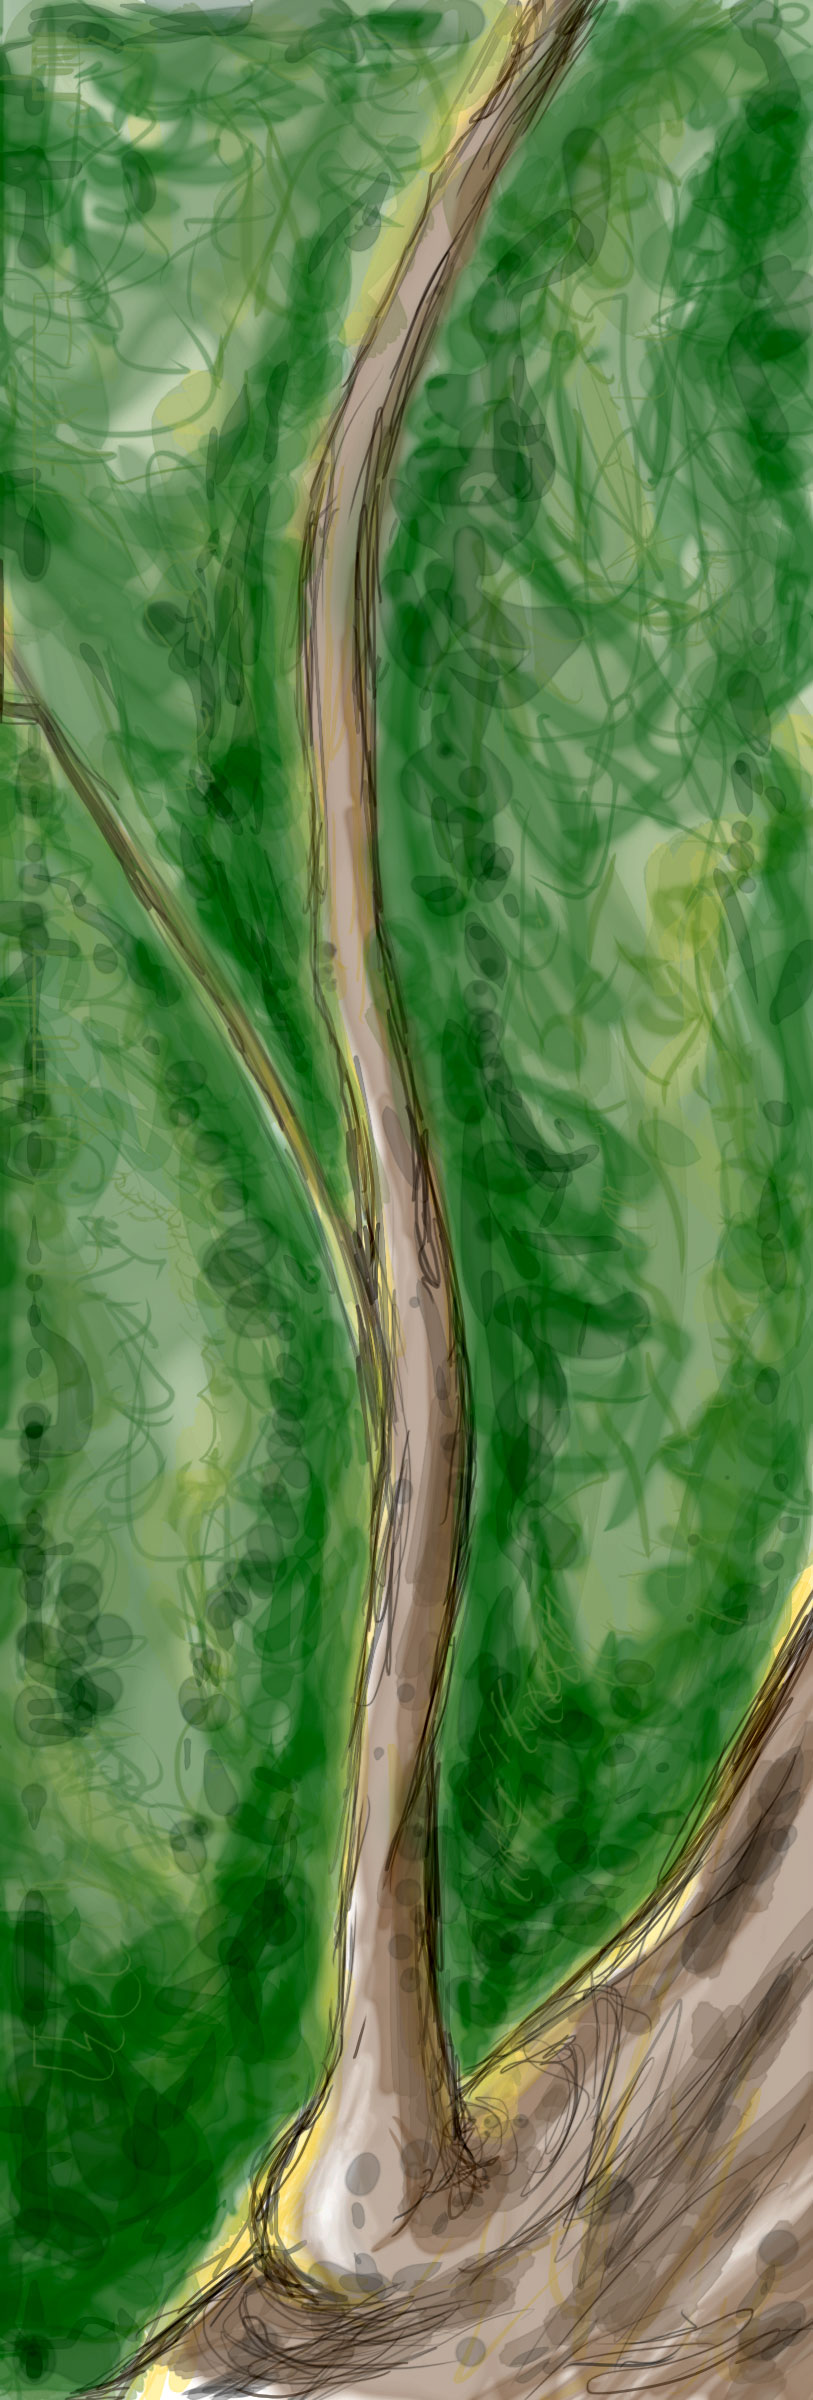 Tree Concept art #1